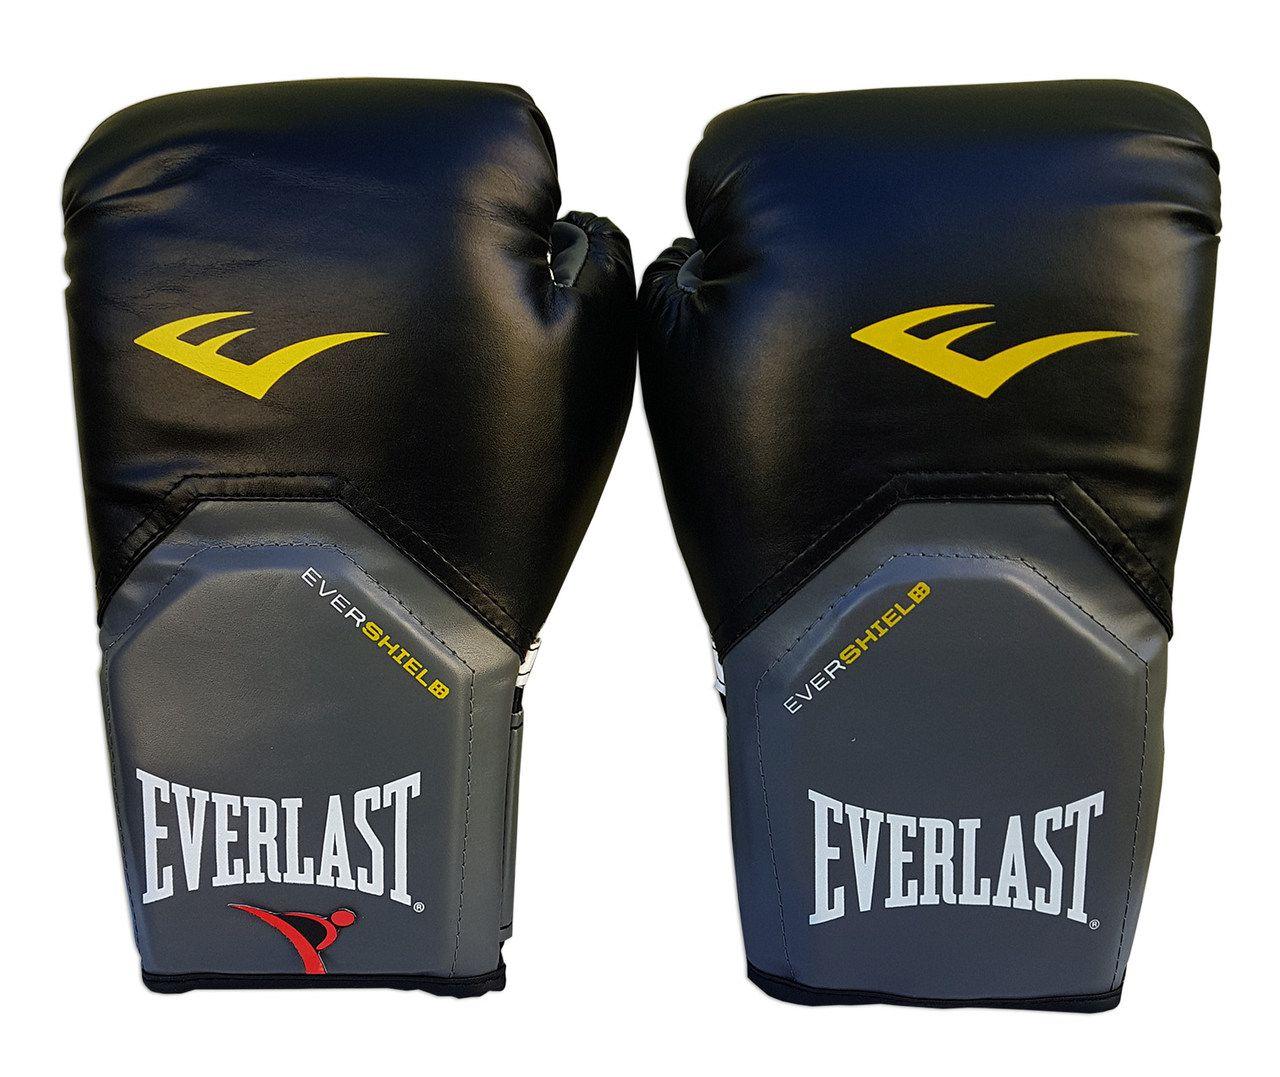 Luva de Boxe / Muay Thai 08oz - Preto - Pro Style - Everlast  - PRALUTA SHOP